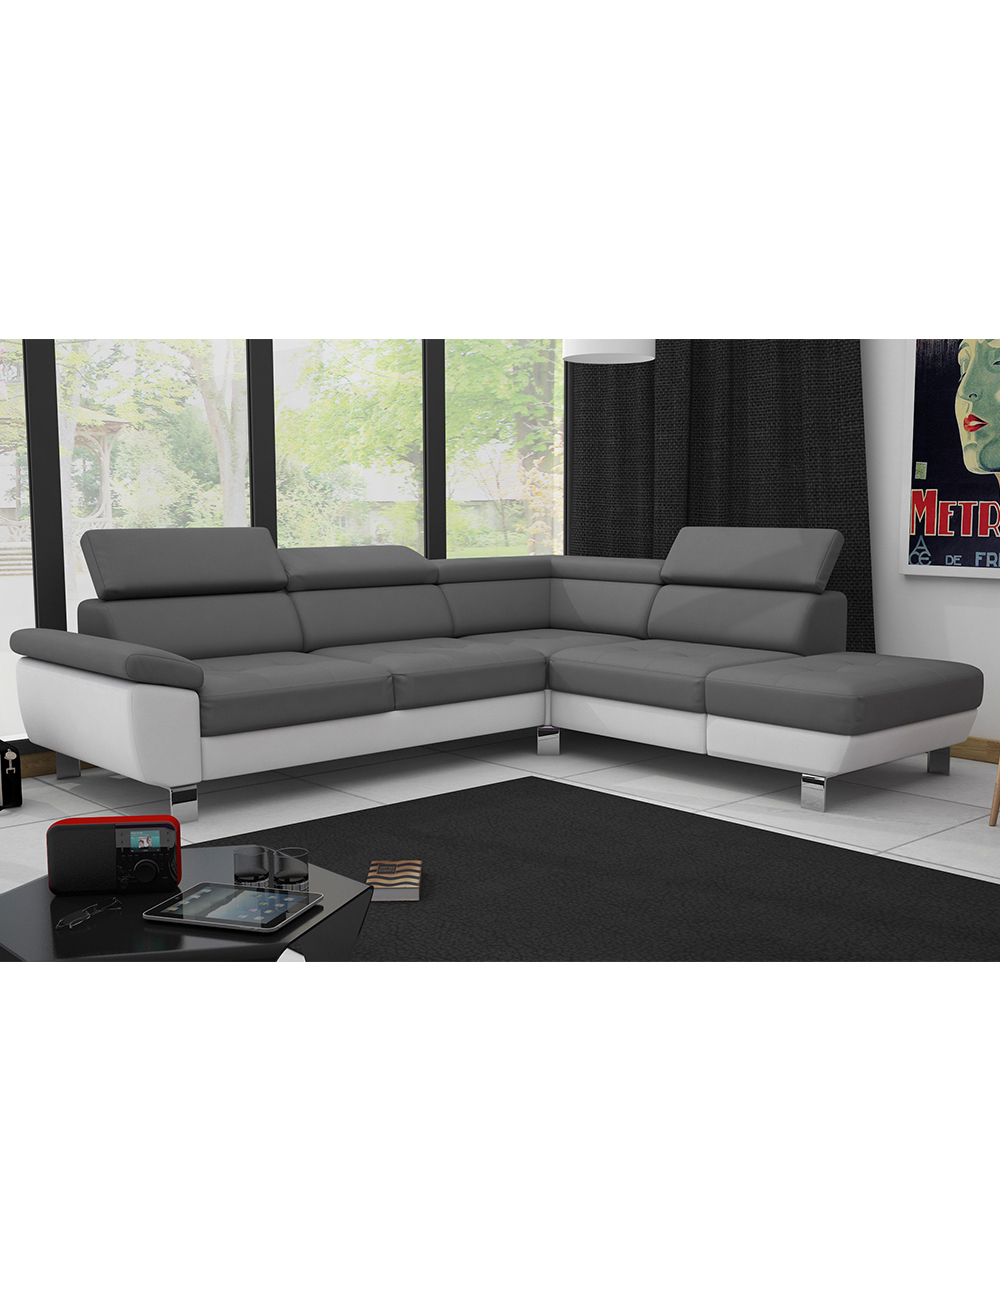 ecksofa kate verstellbare kopfst tzen grau weiss. Black Bedroom Furniture Sets. Home Design Ideas